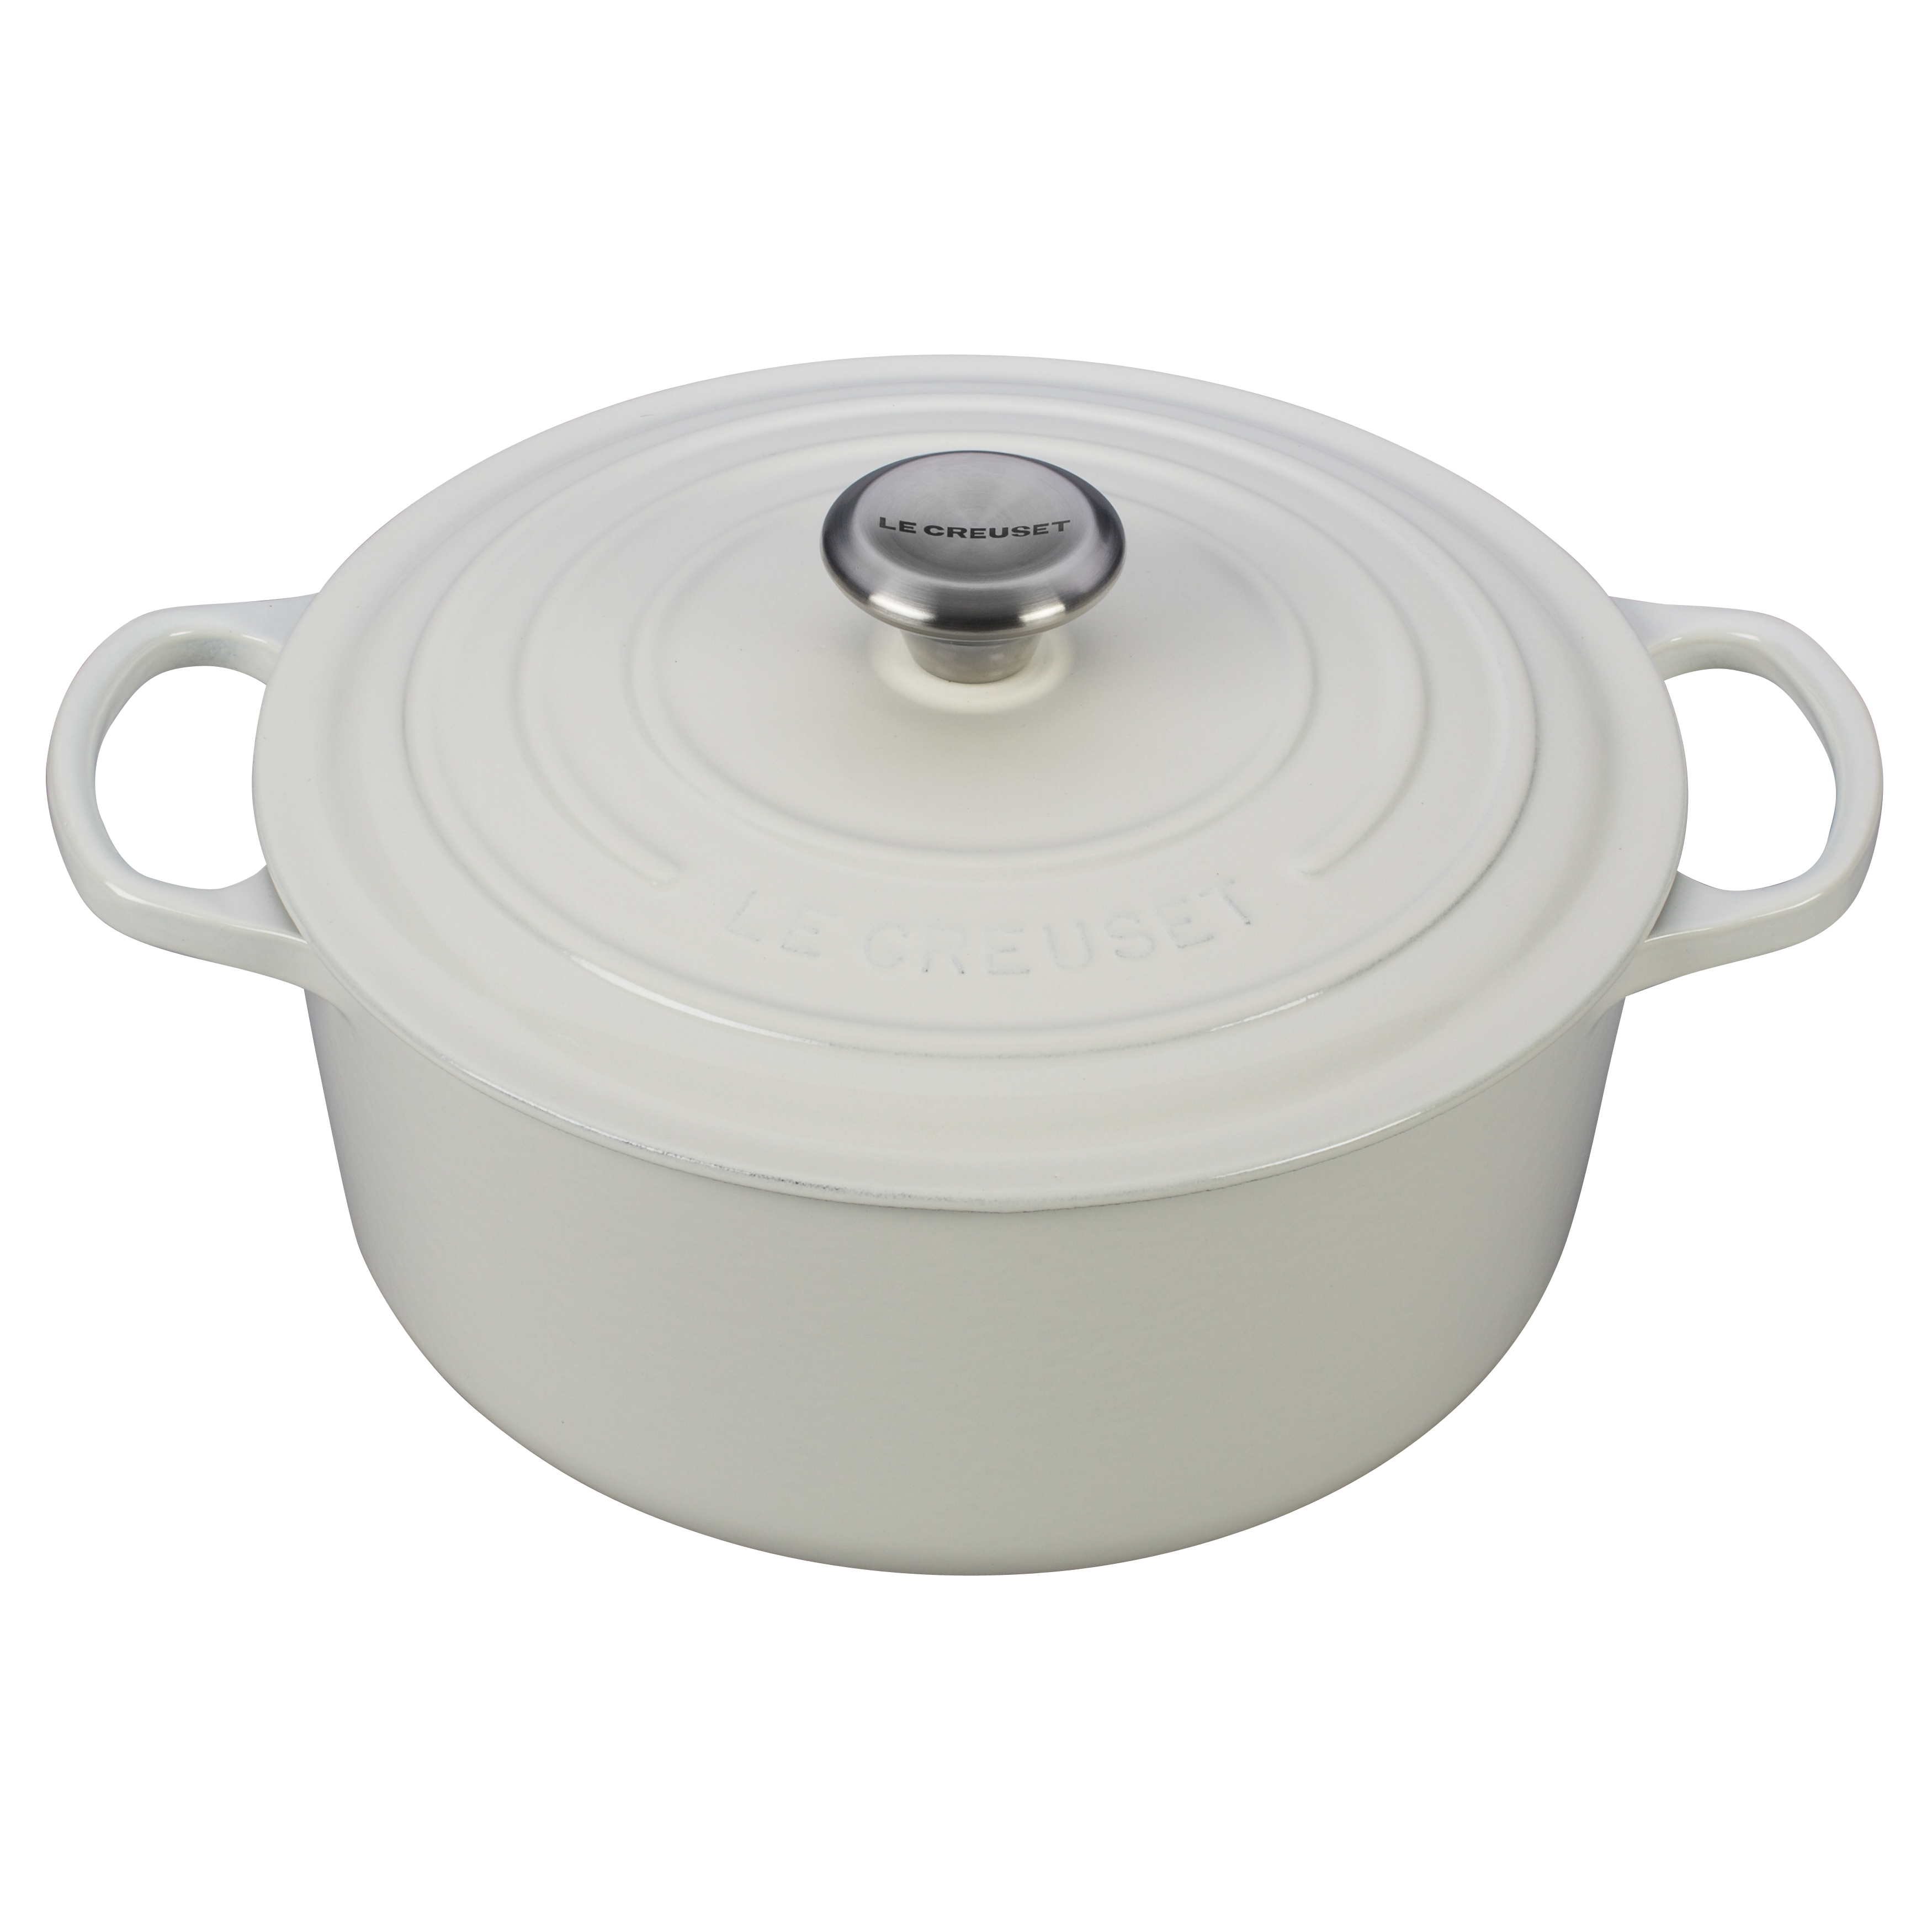 Le Creuset Signature White Enameled Cast Iron 5.5 Quart Round Dutch Oven